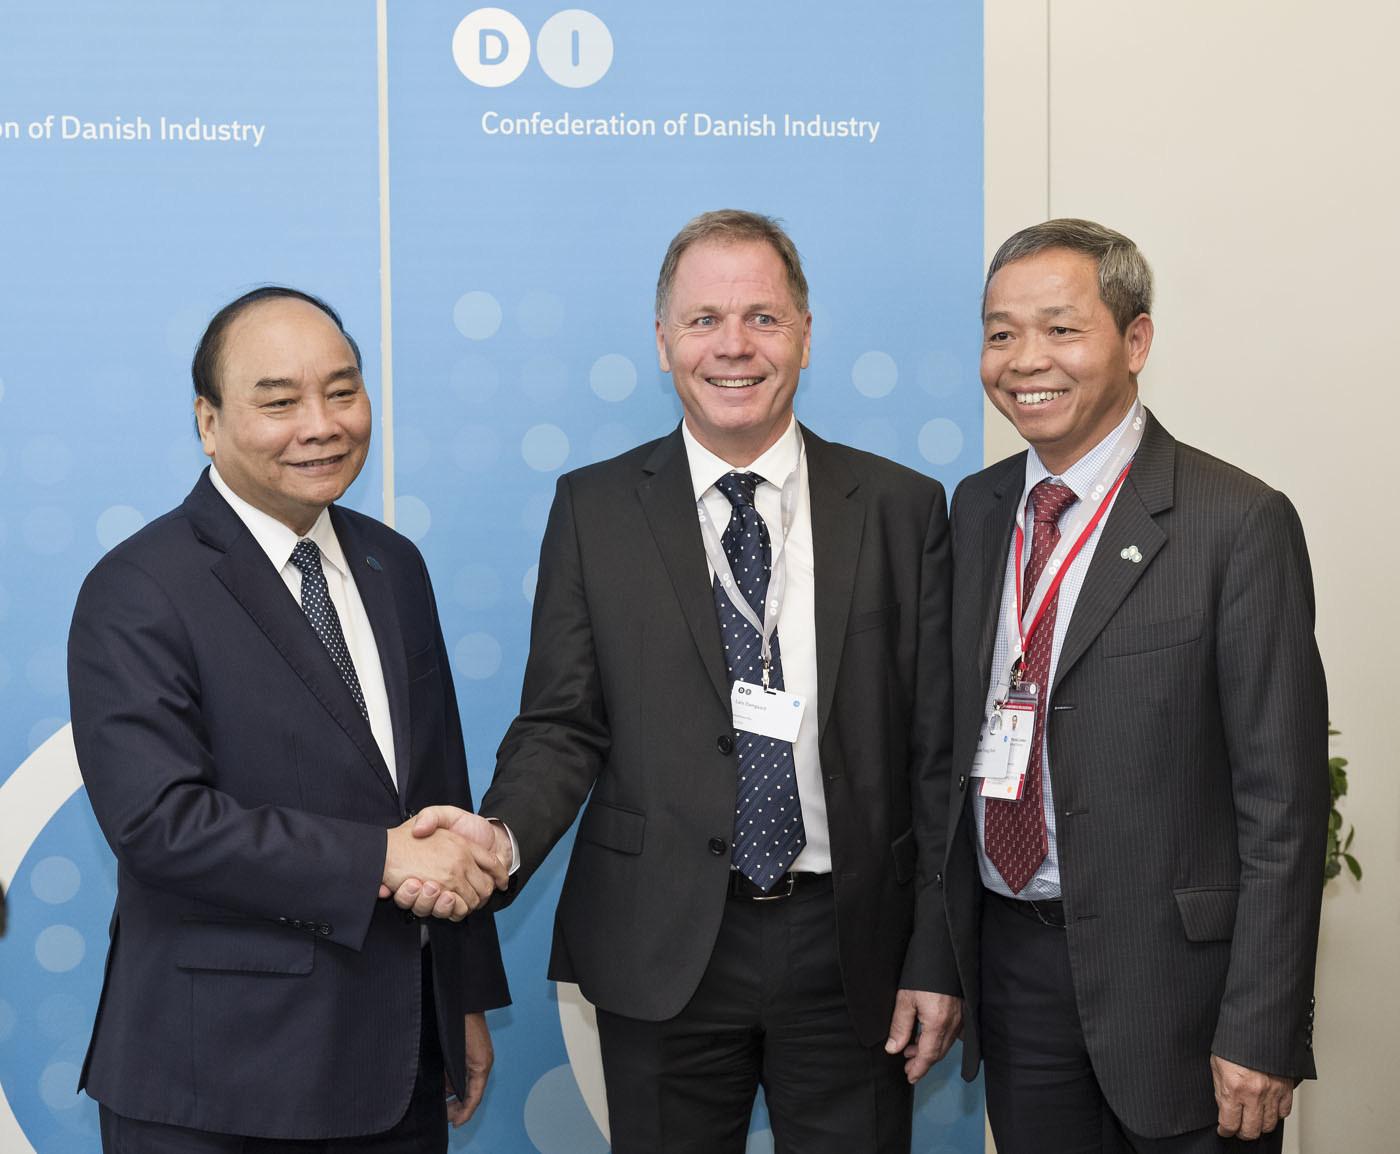 Vietnam's PM Nguyen Xuan Phuc congratulated strategic cooperation between CMC & Approxima